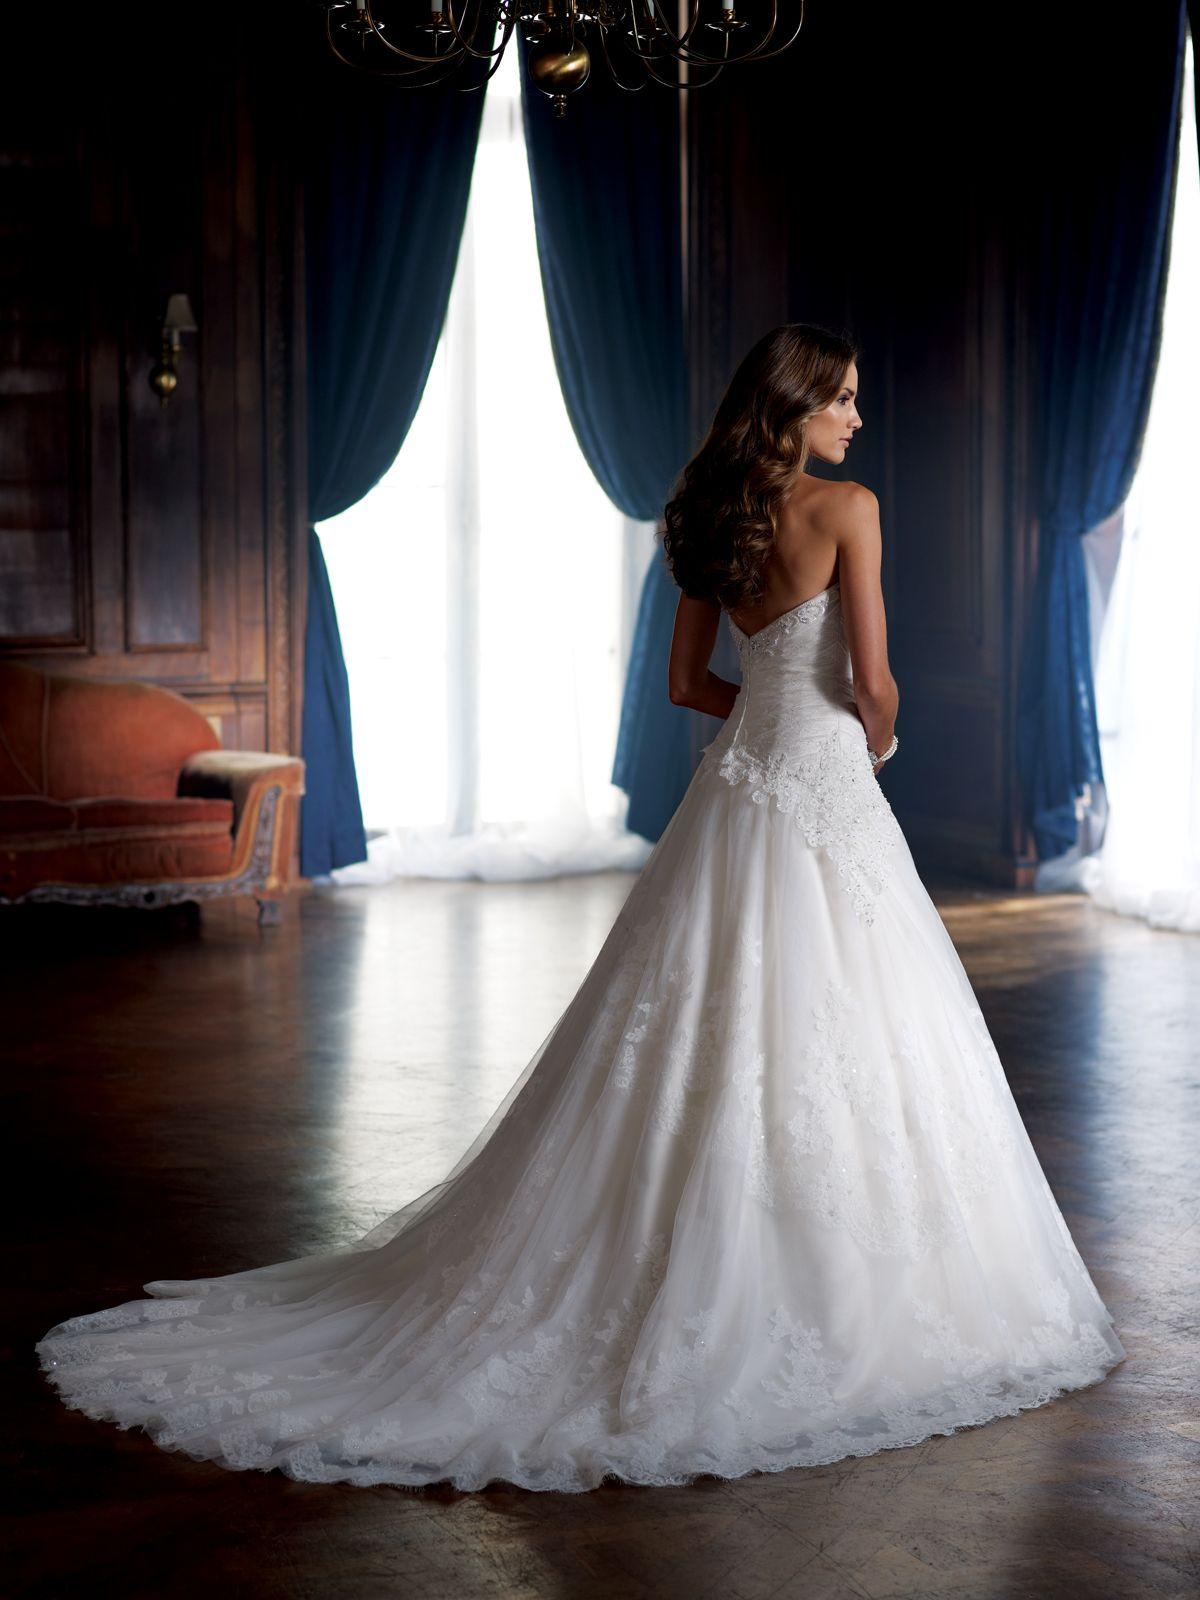 Style No. 213250 » David Tutera for Mon Cheri»wedding dresses 2013 and bridal gowns 2014